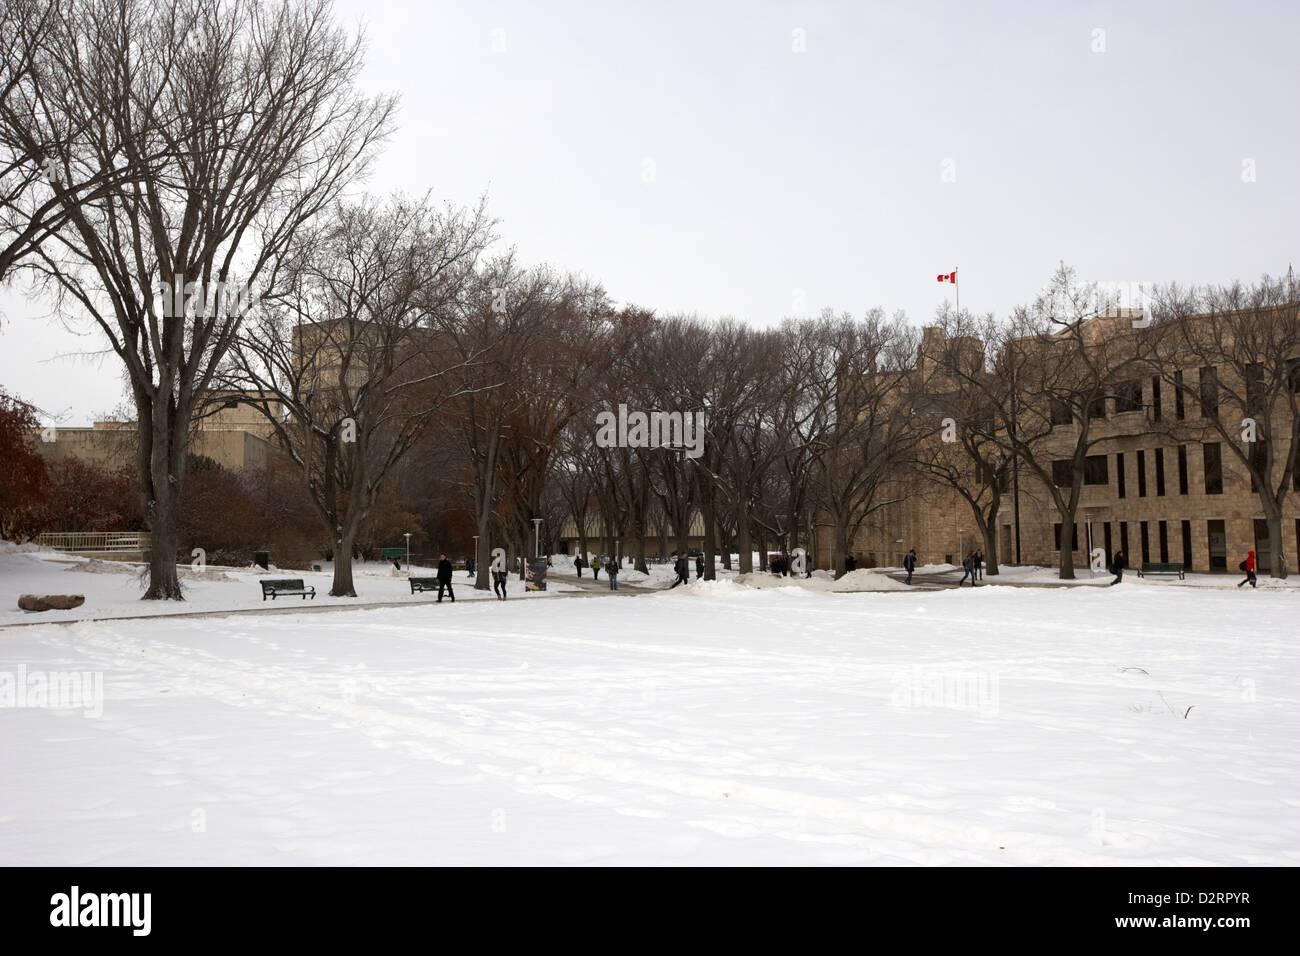 the bowl open space university of Saskatchewan Saskatoon in winter Canada - Stock Image